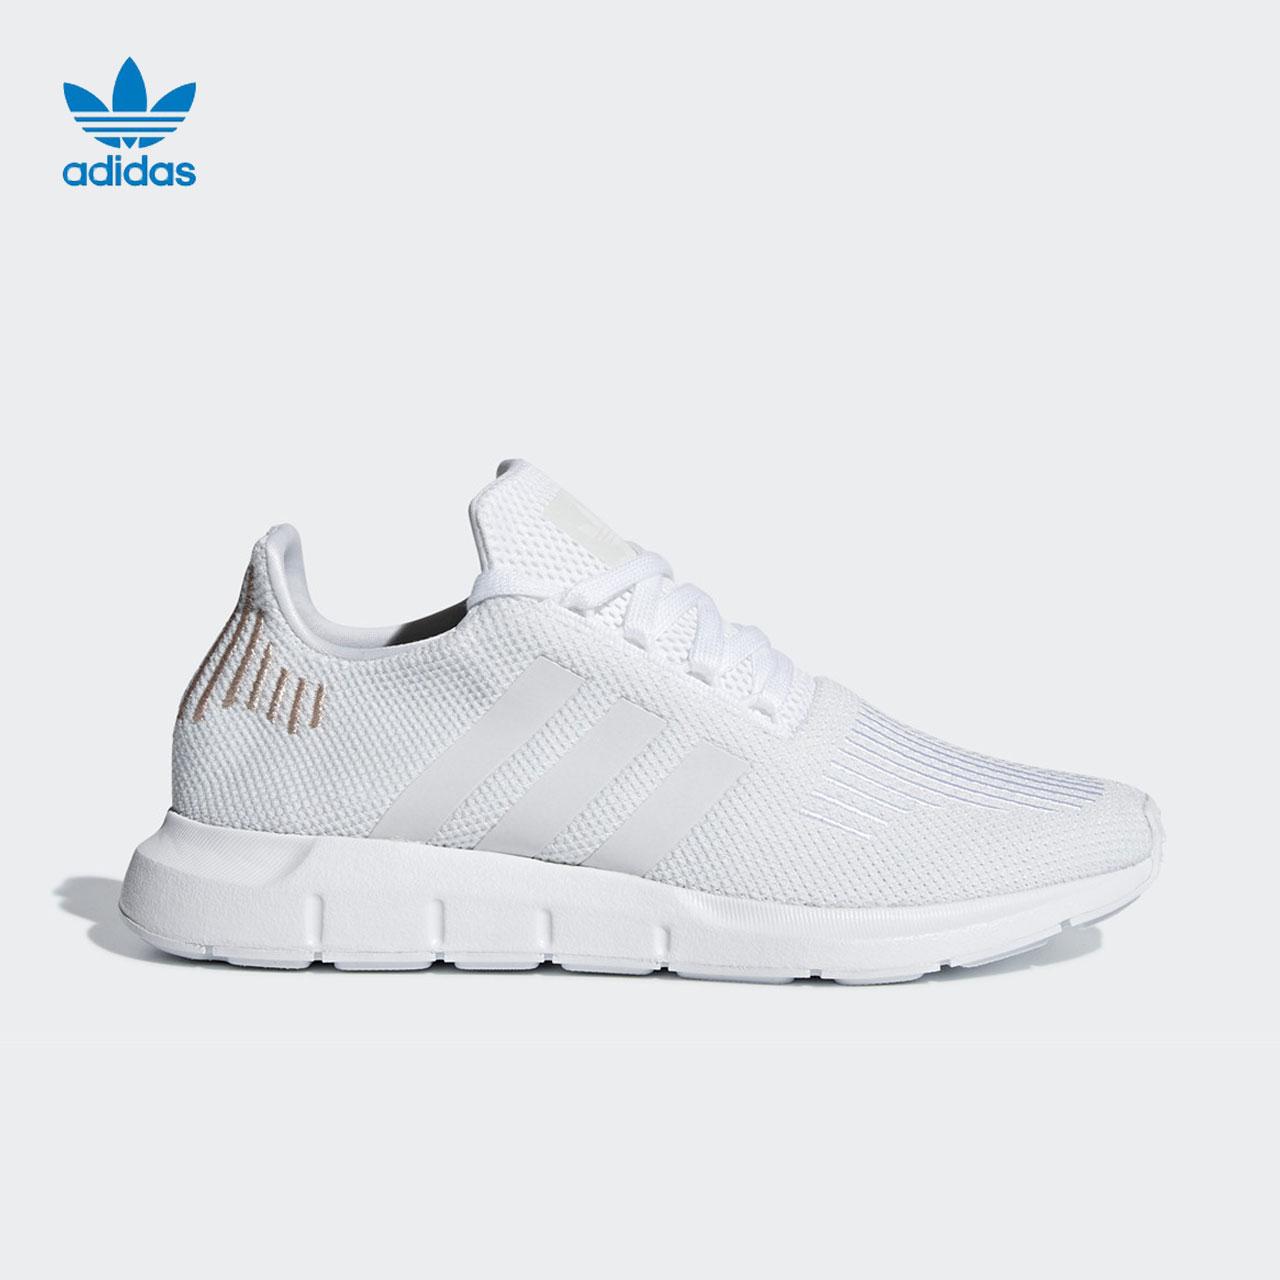 adidas Originals阿迪三叶草2018女子Swift Run W休闲鞋B37719